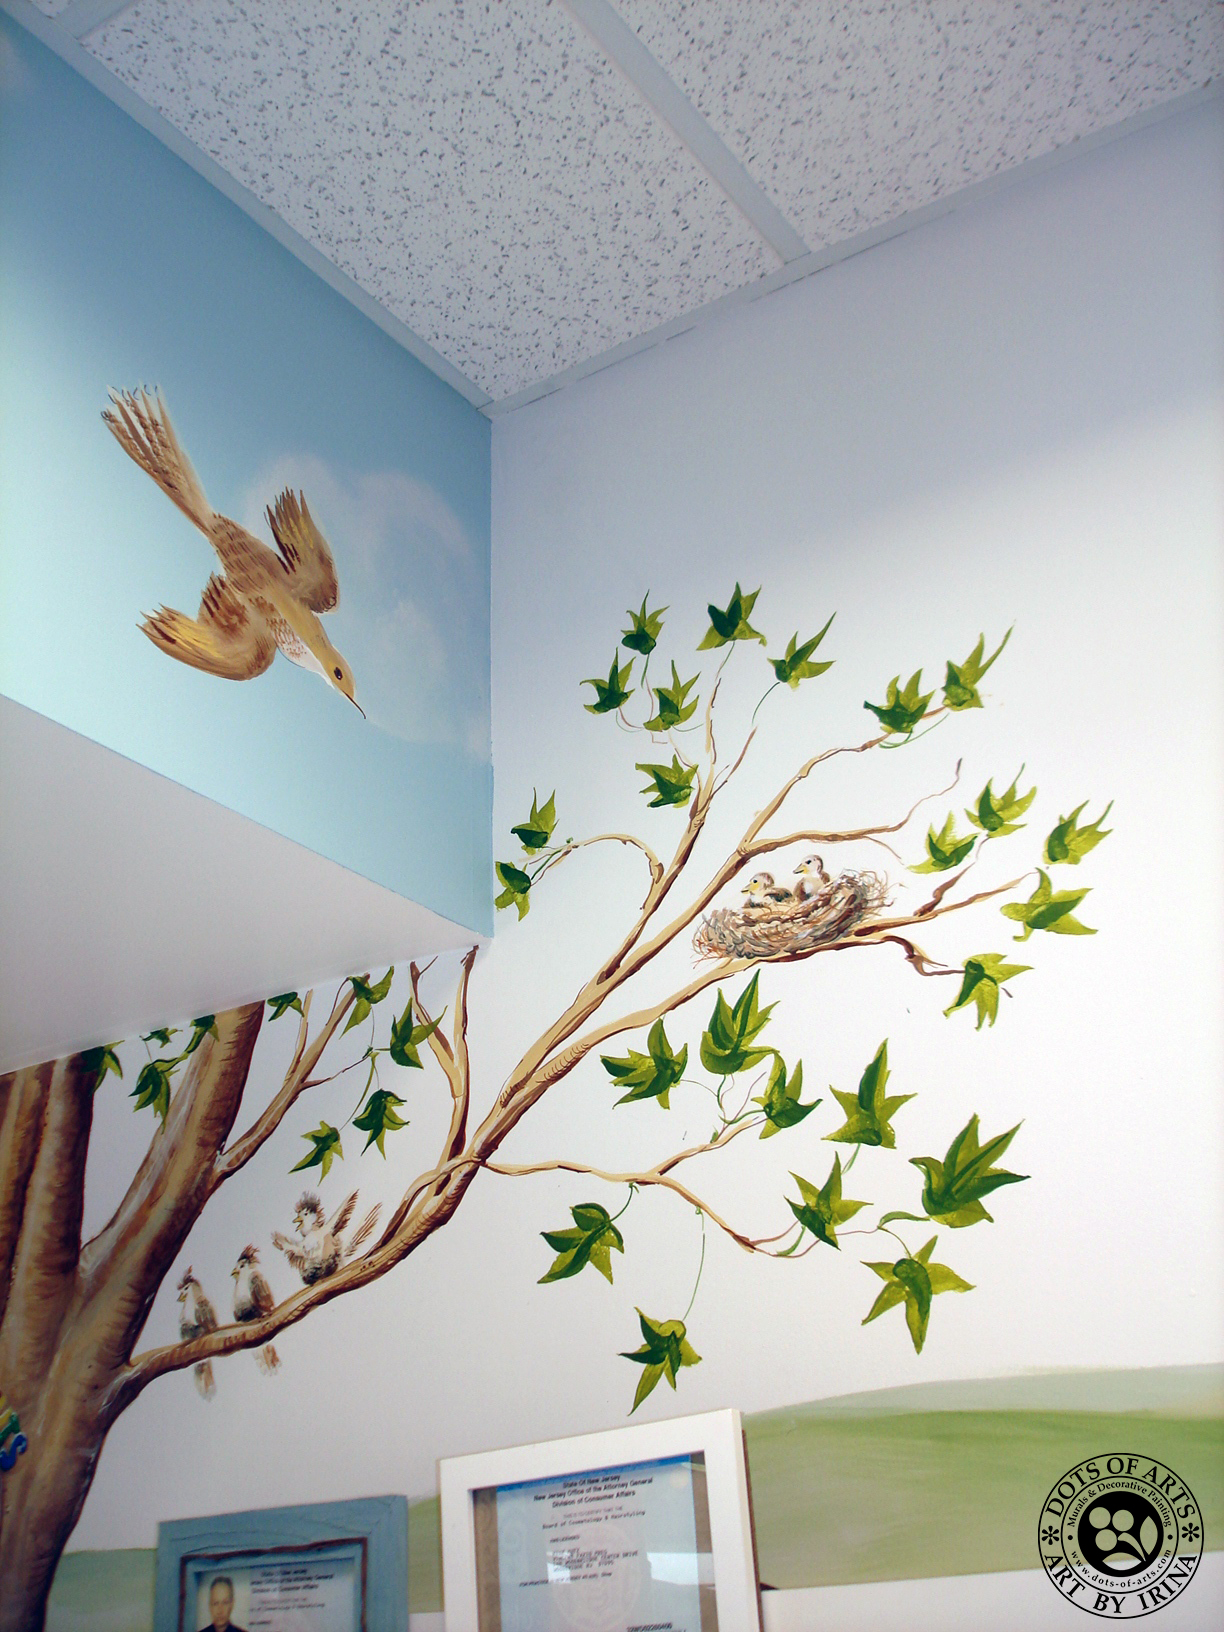 mural-custom-wall-commercial-kidz-kuts-woodbridge-nj-dots-of-arts-bird-nest-tree-branches.jpg